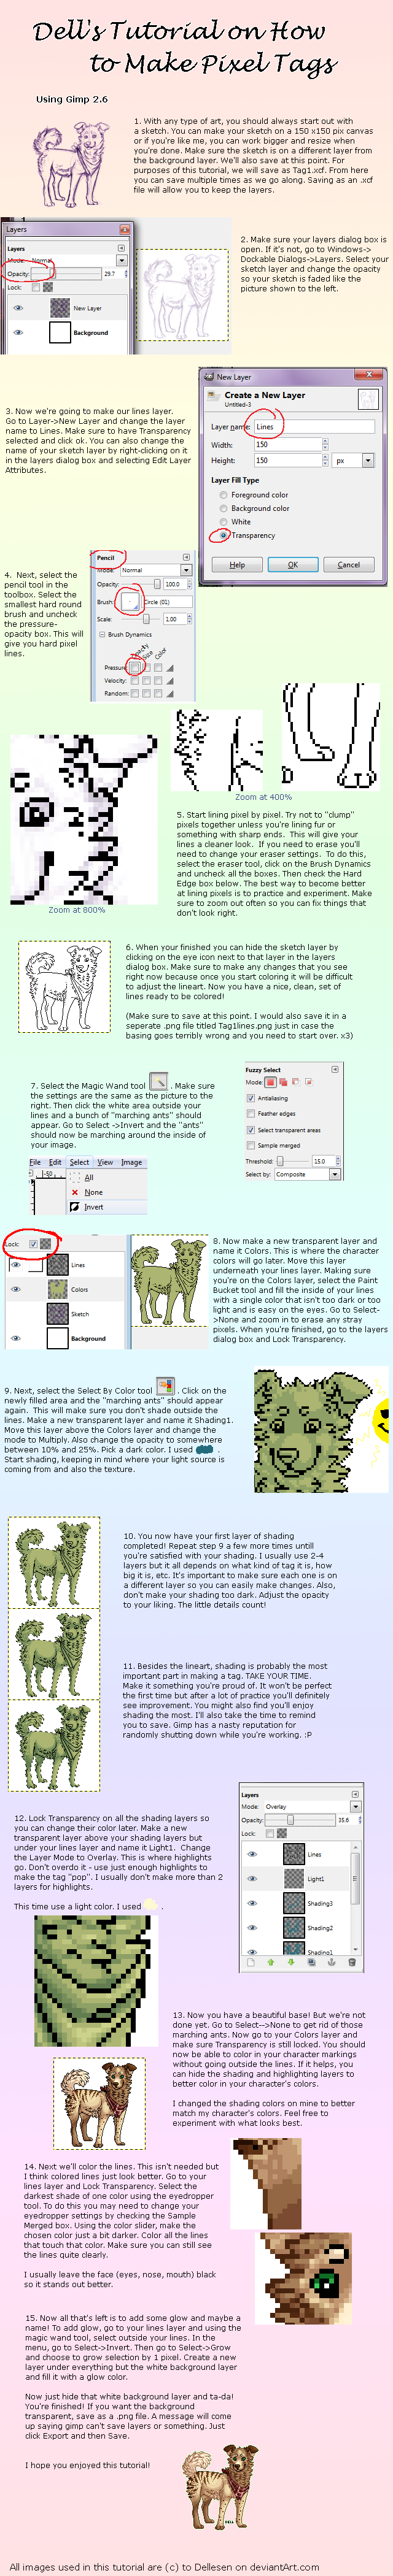 Gimp 2.6 Pixel Tag Tutorial by Dellesen